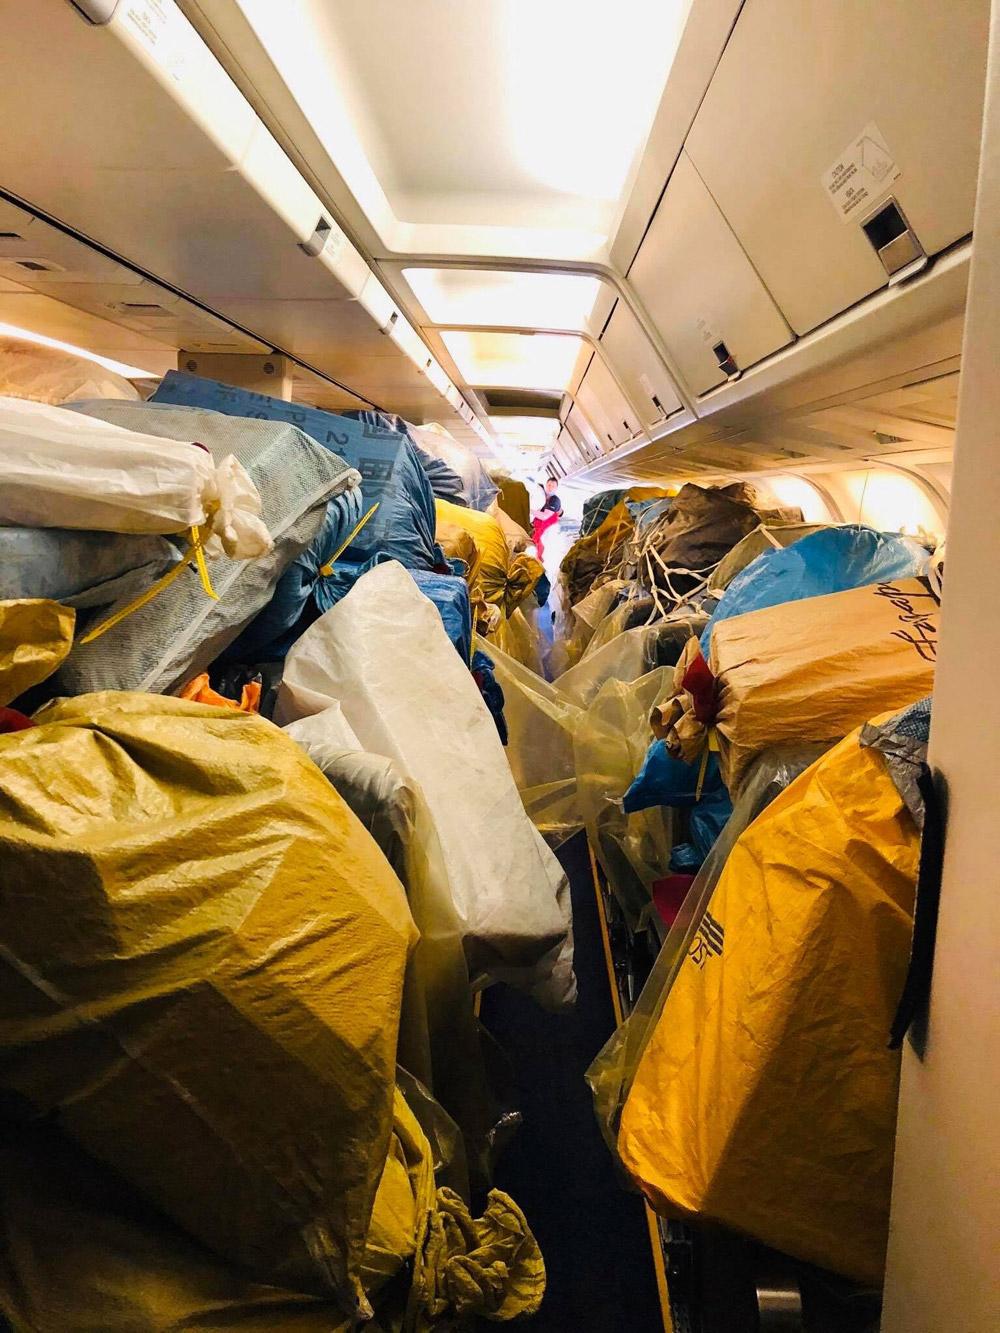 Мешки с почтой в пассажирском салоне Boeing 767 МАУ